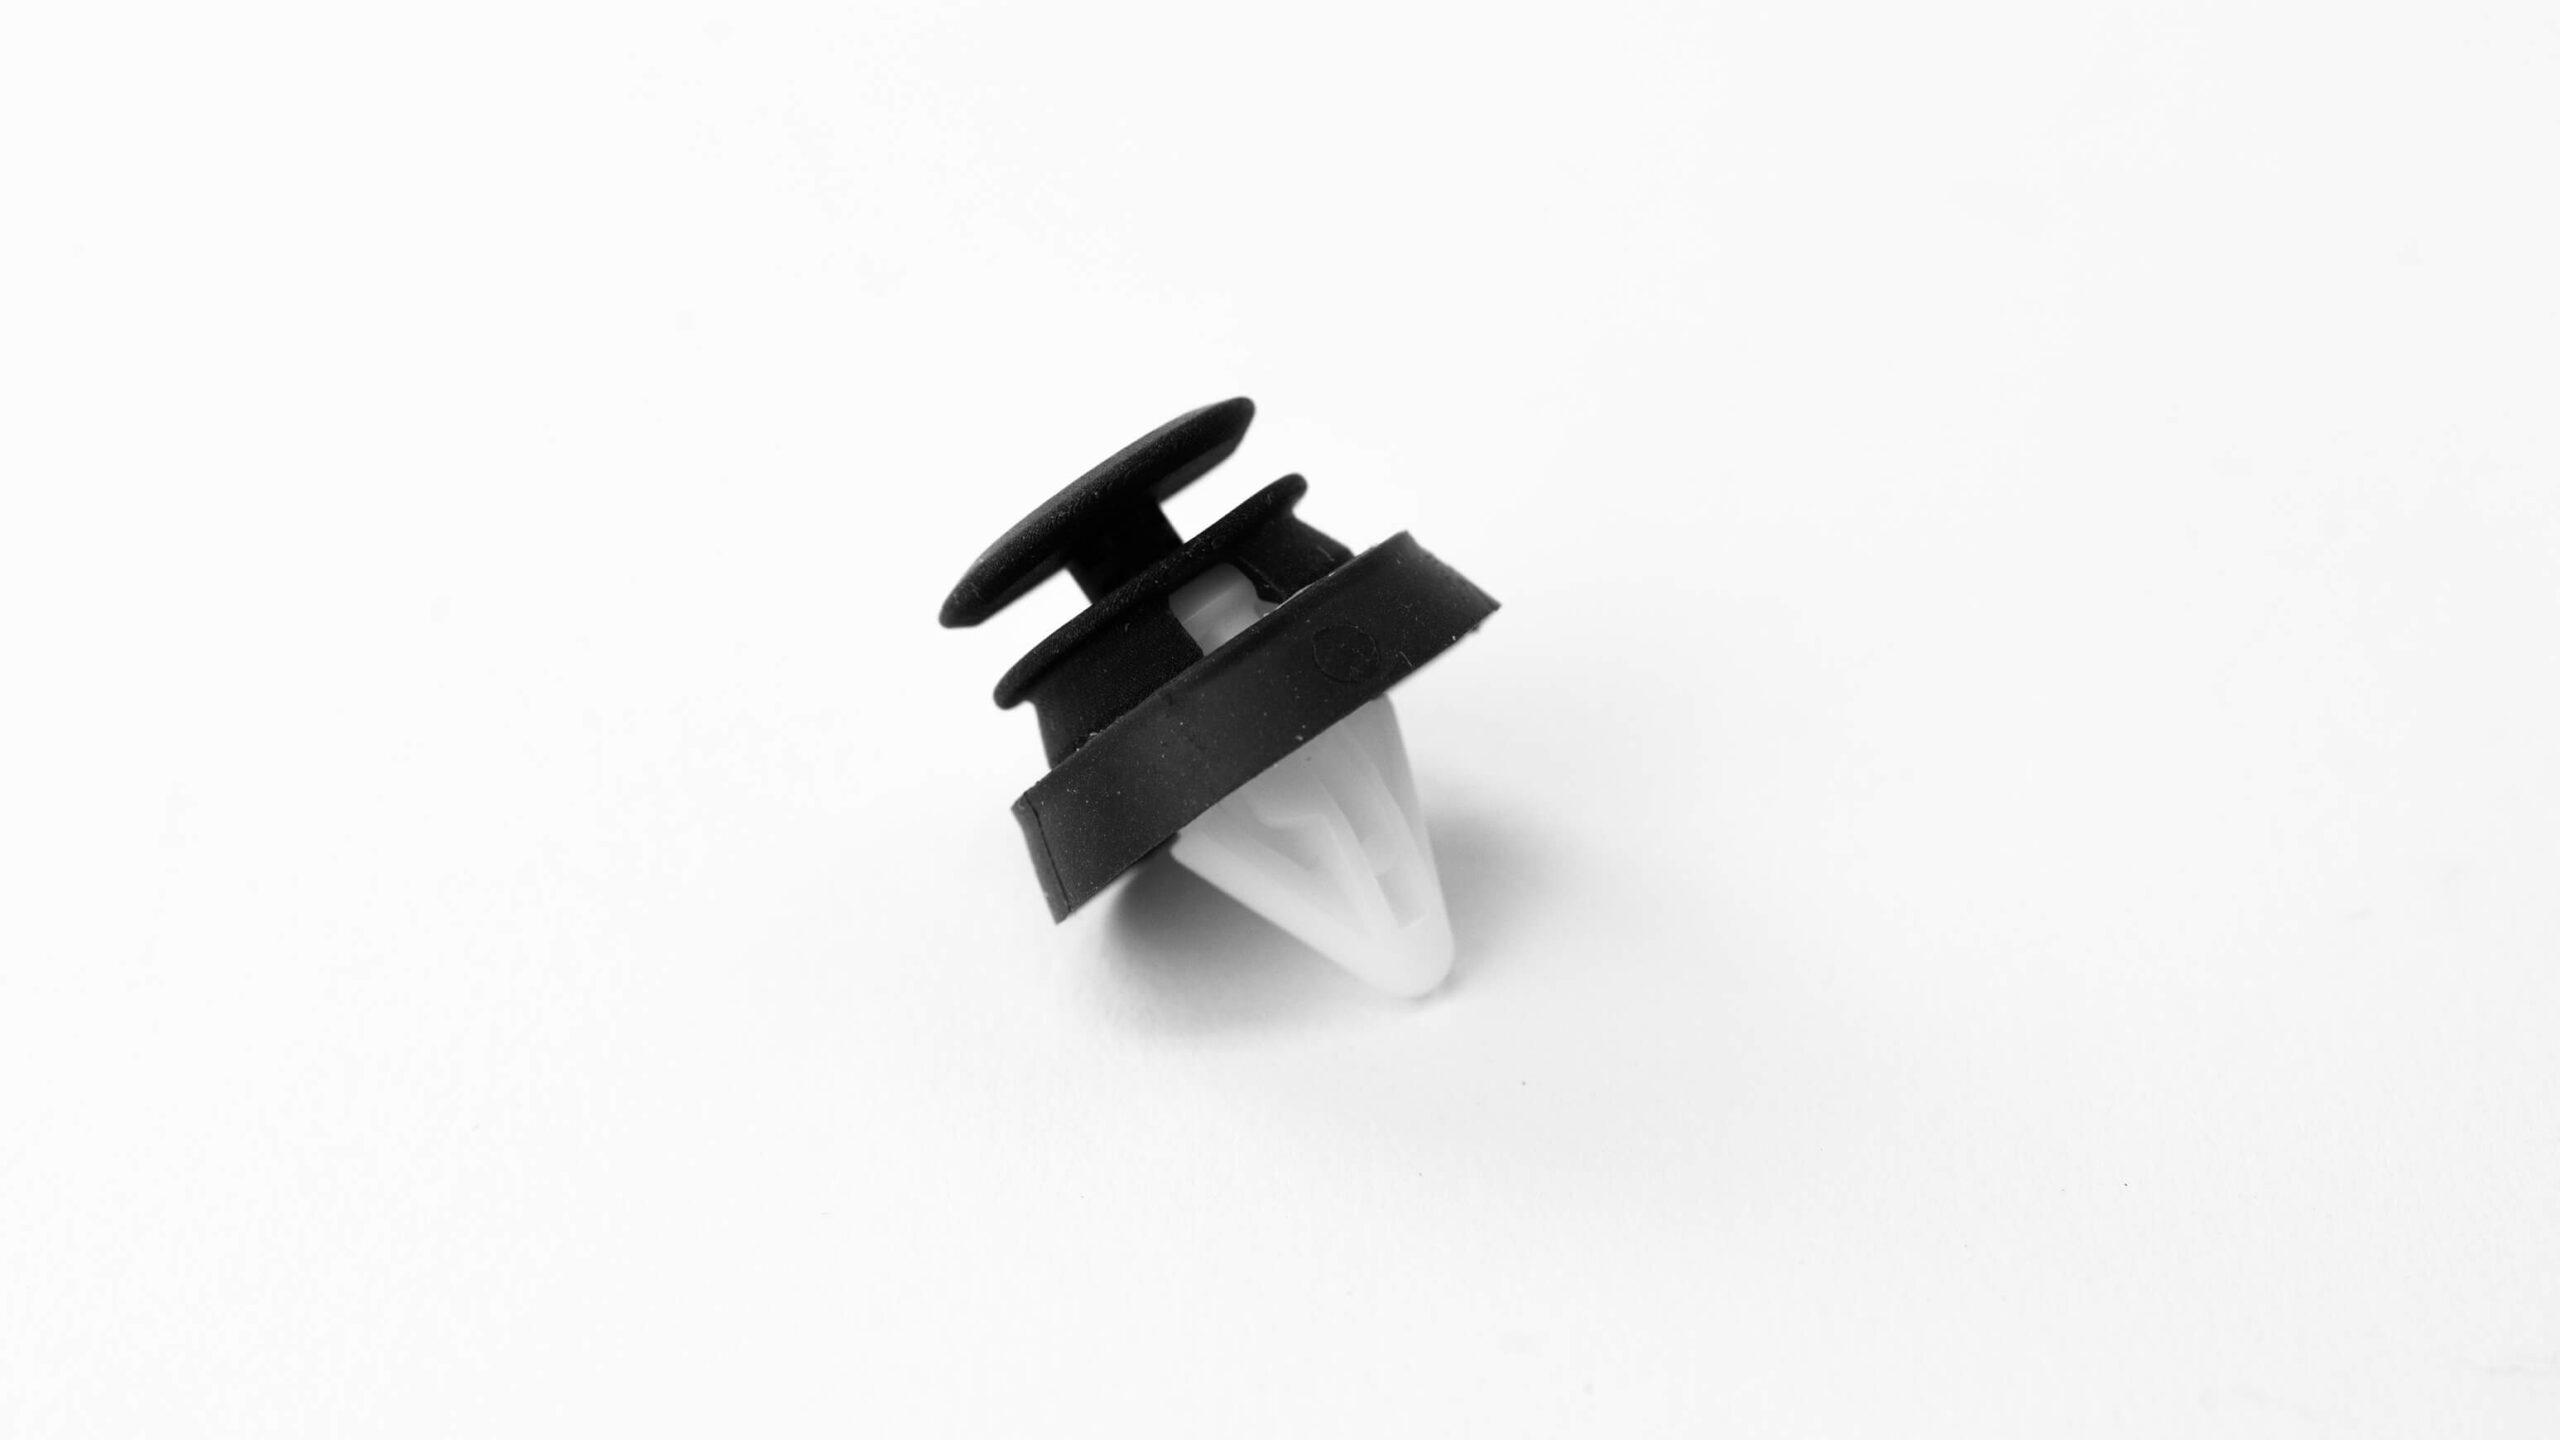 Assembled ARaymond trim-clip fastener functional prototype